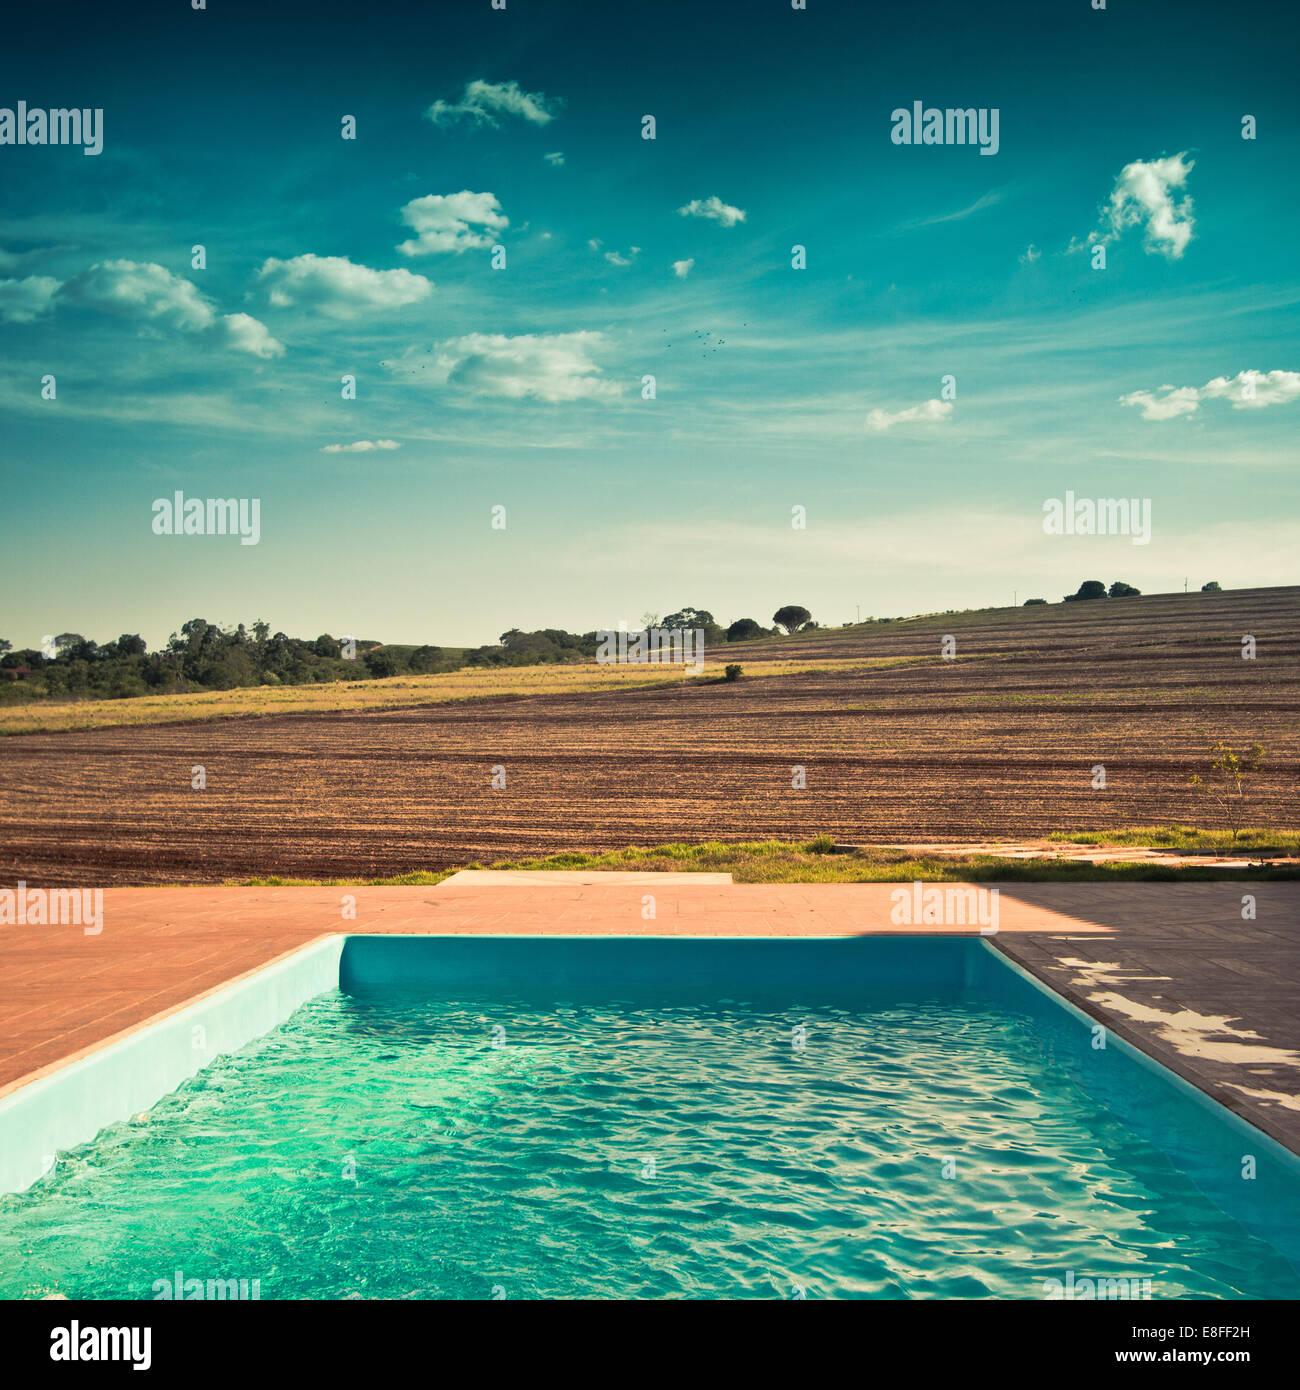 Outdoor-Pool und Blick über die Felder Stockbild